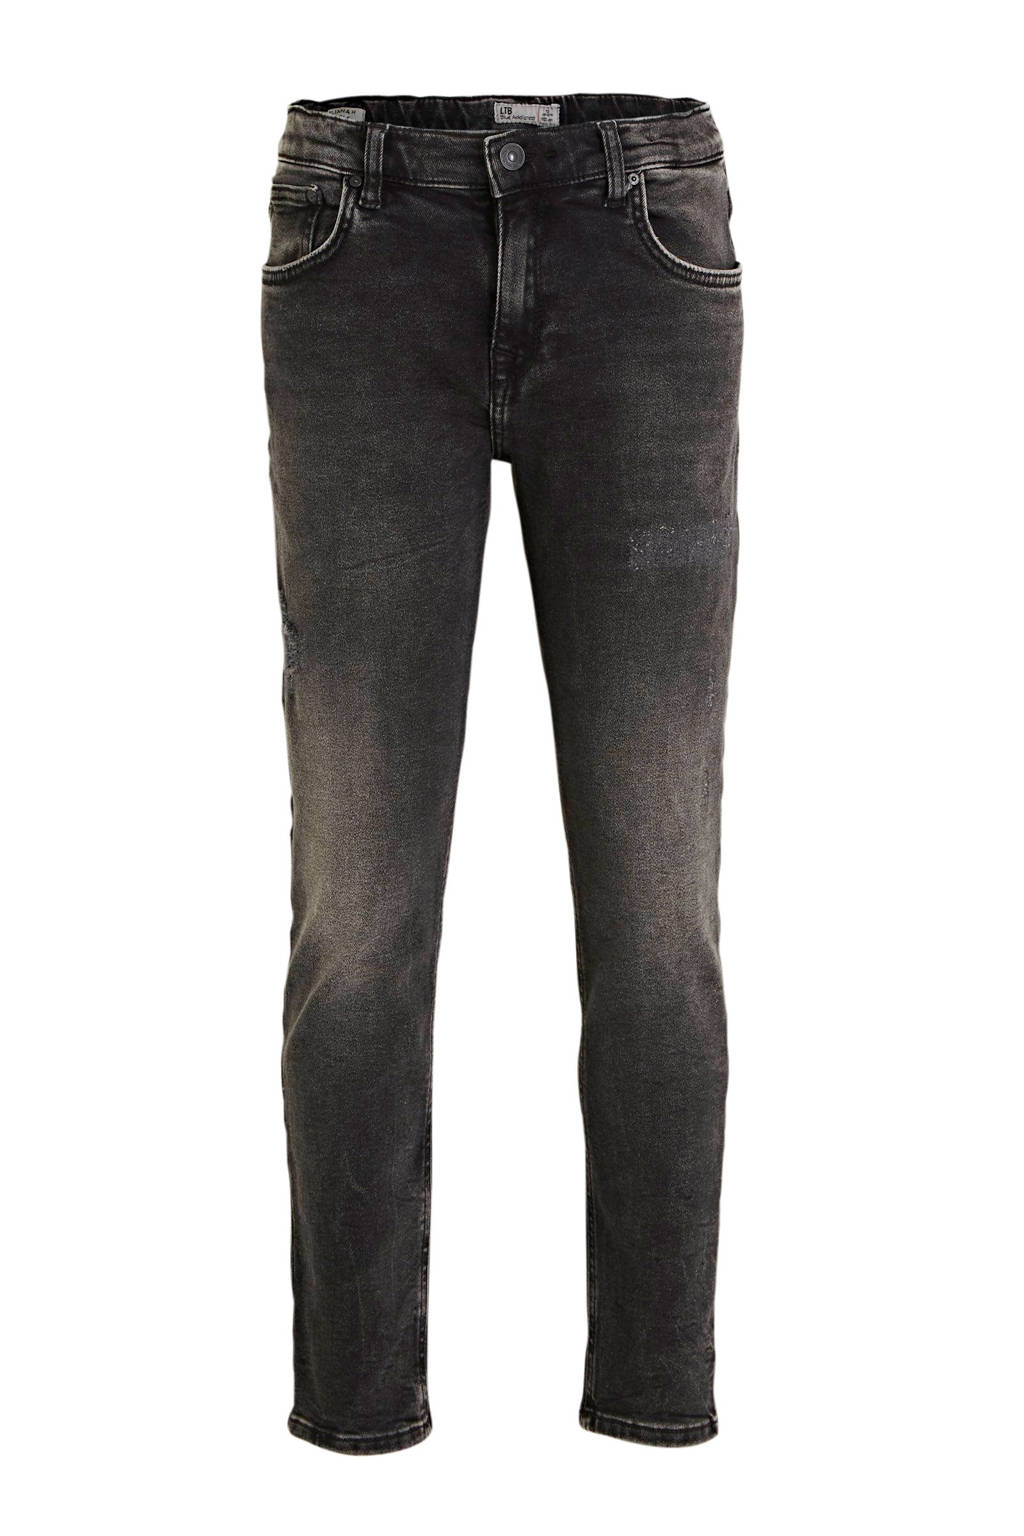 LTB mom jeans Eliana met slijtage grijs stonewashed, Grijs stonewashed